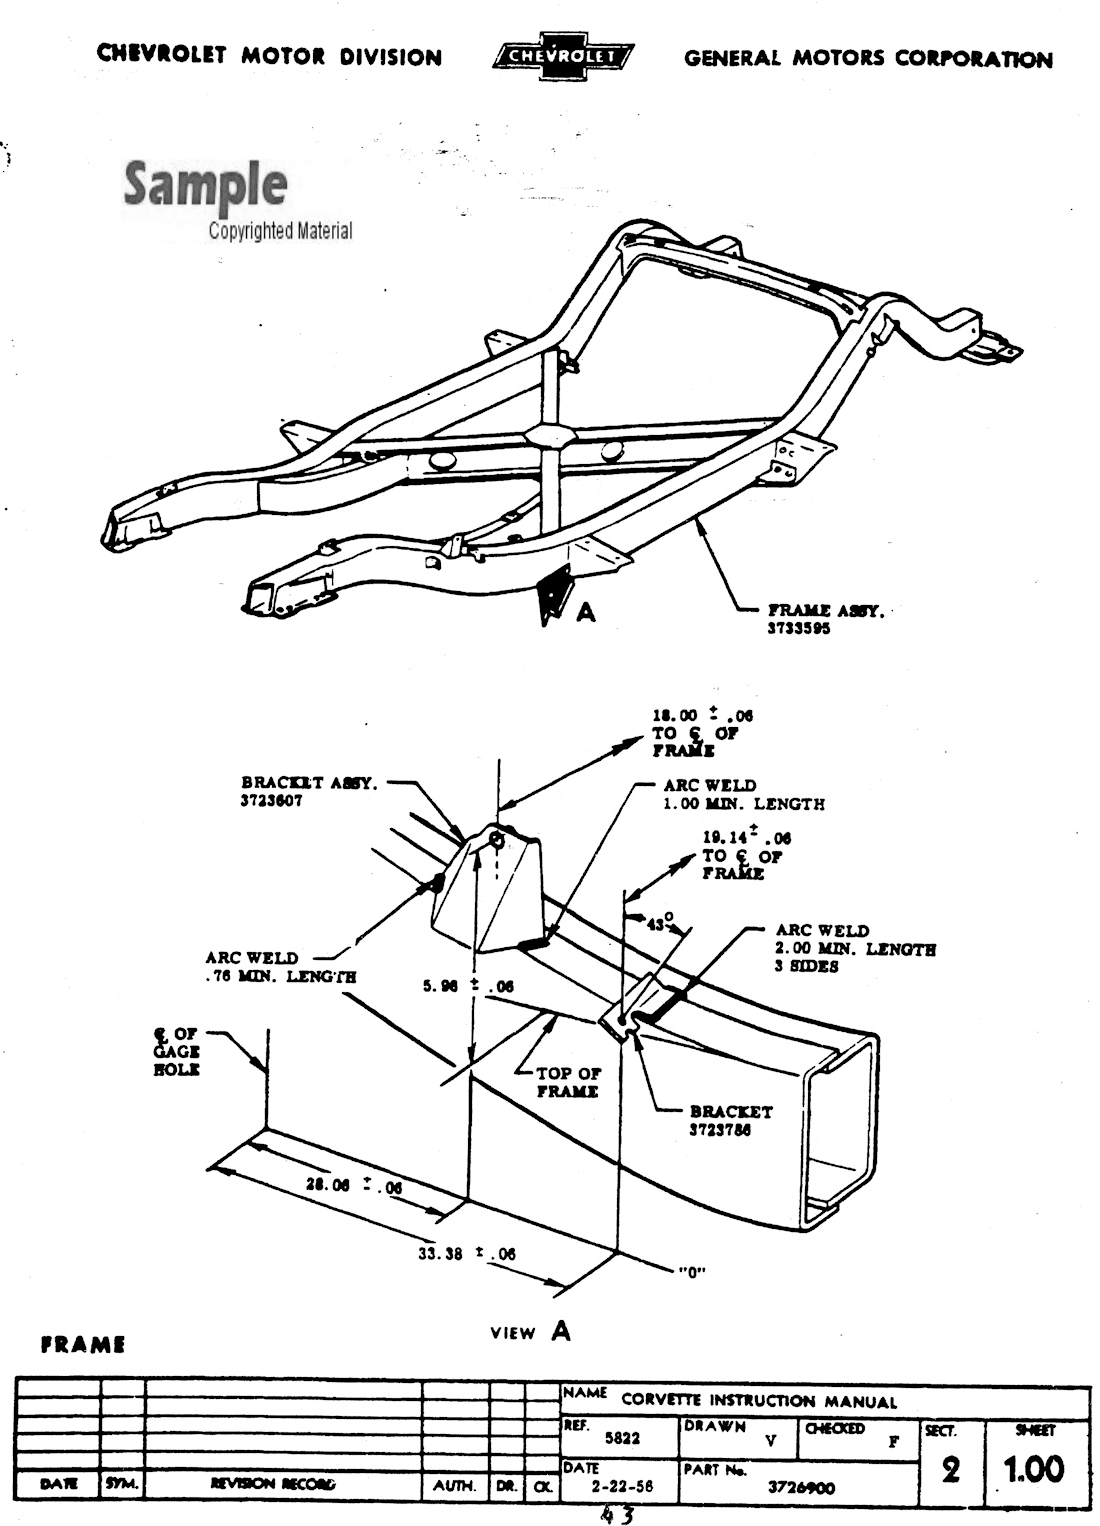 Chevy Corvette 427 Engine